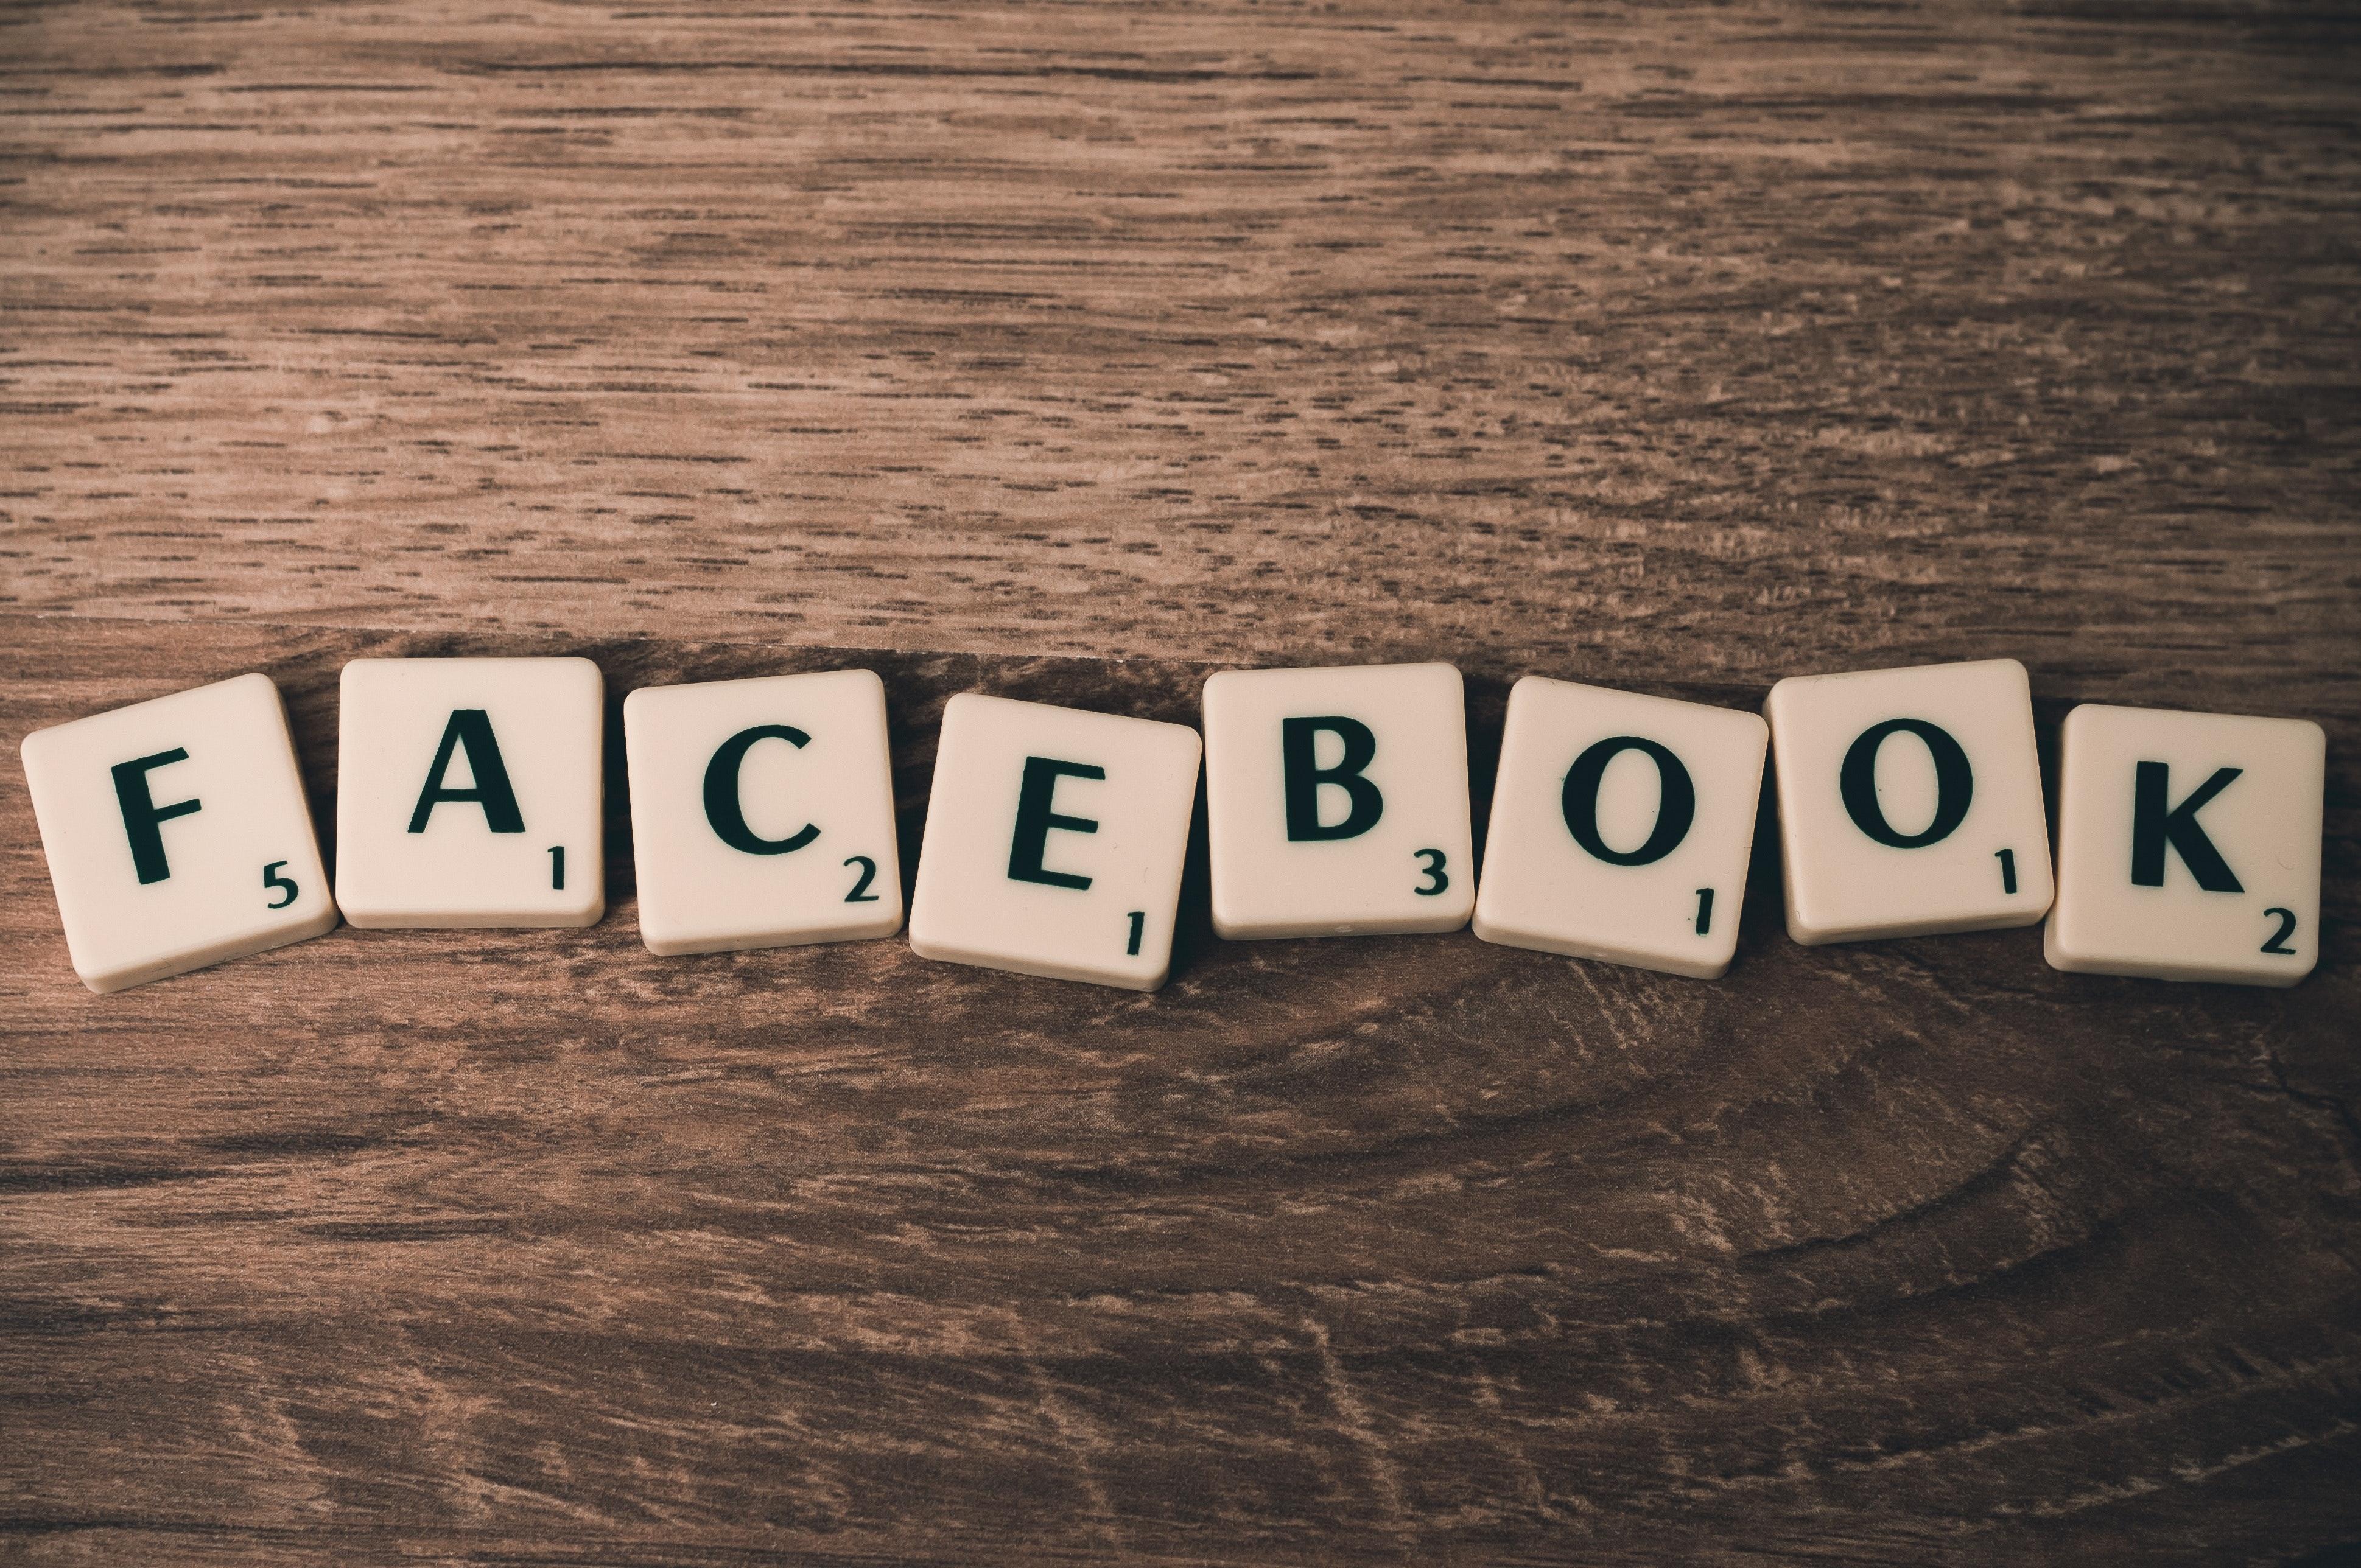 facebook-internet-letters-262545.jpg